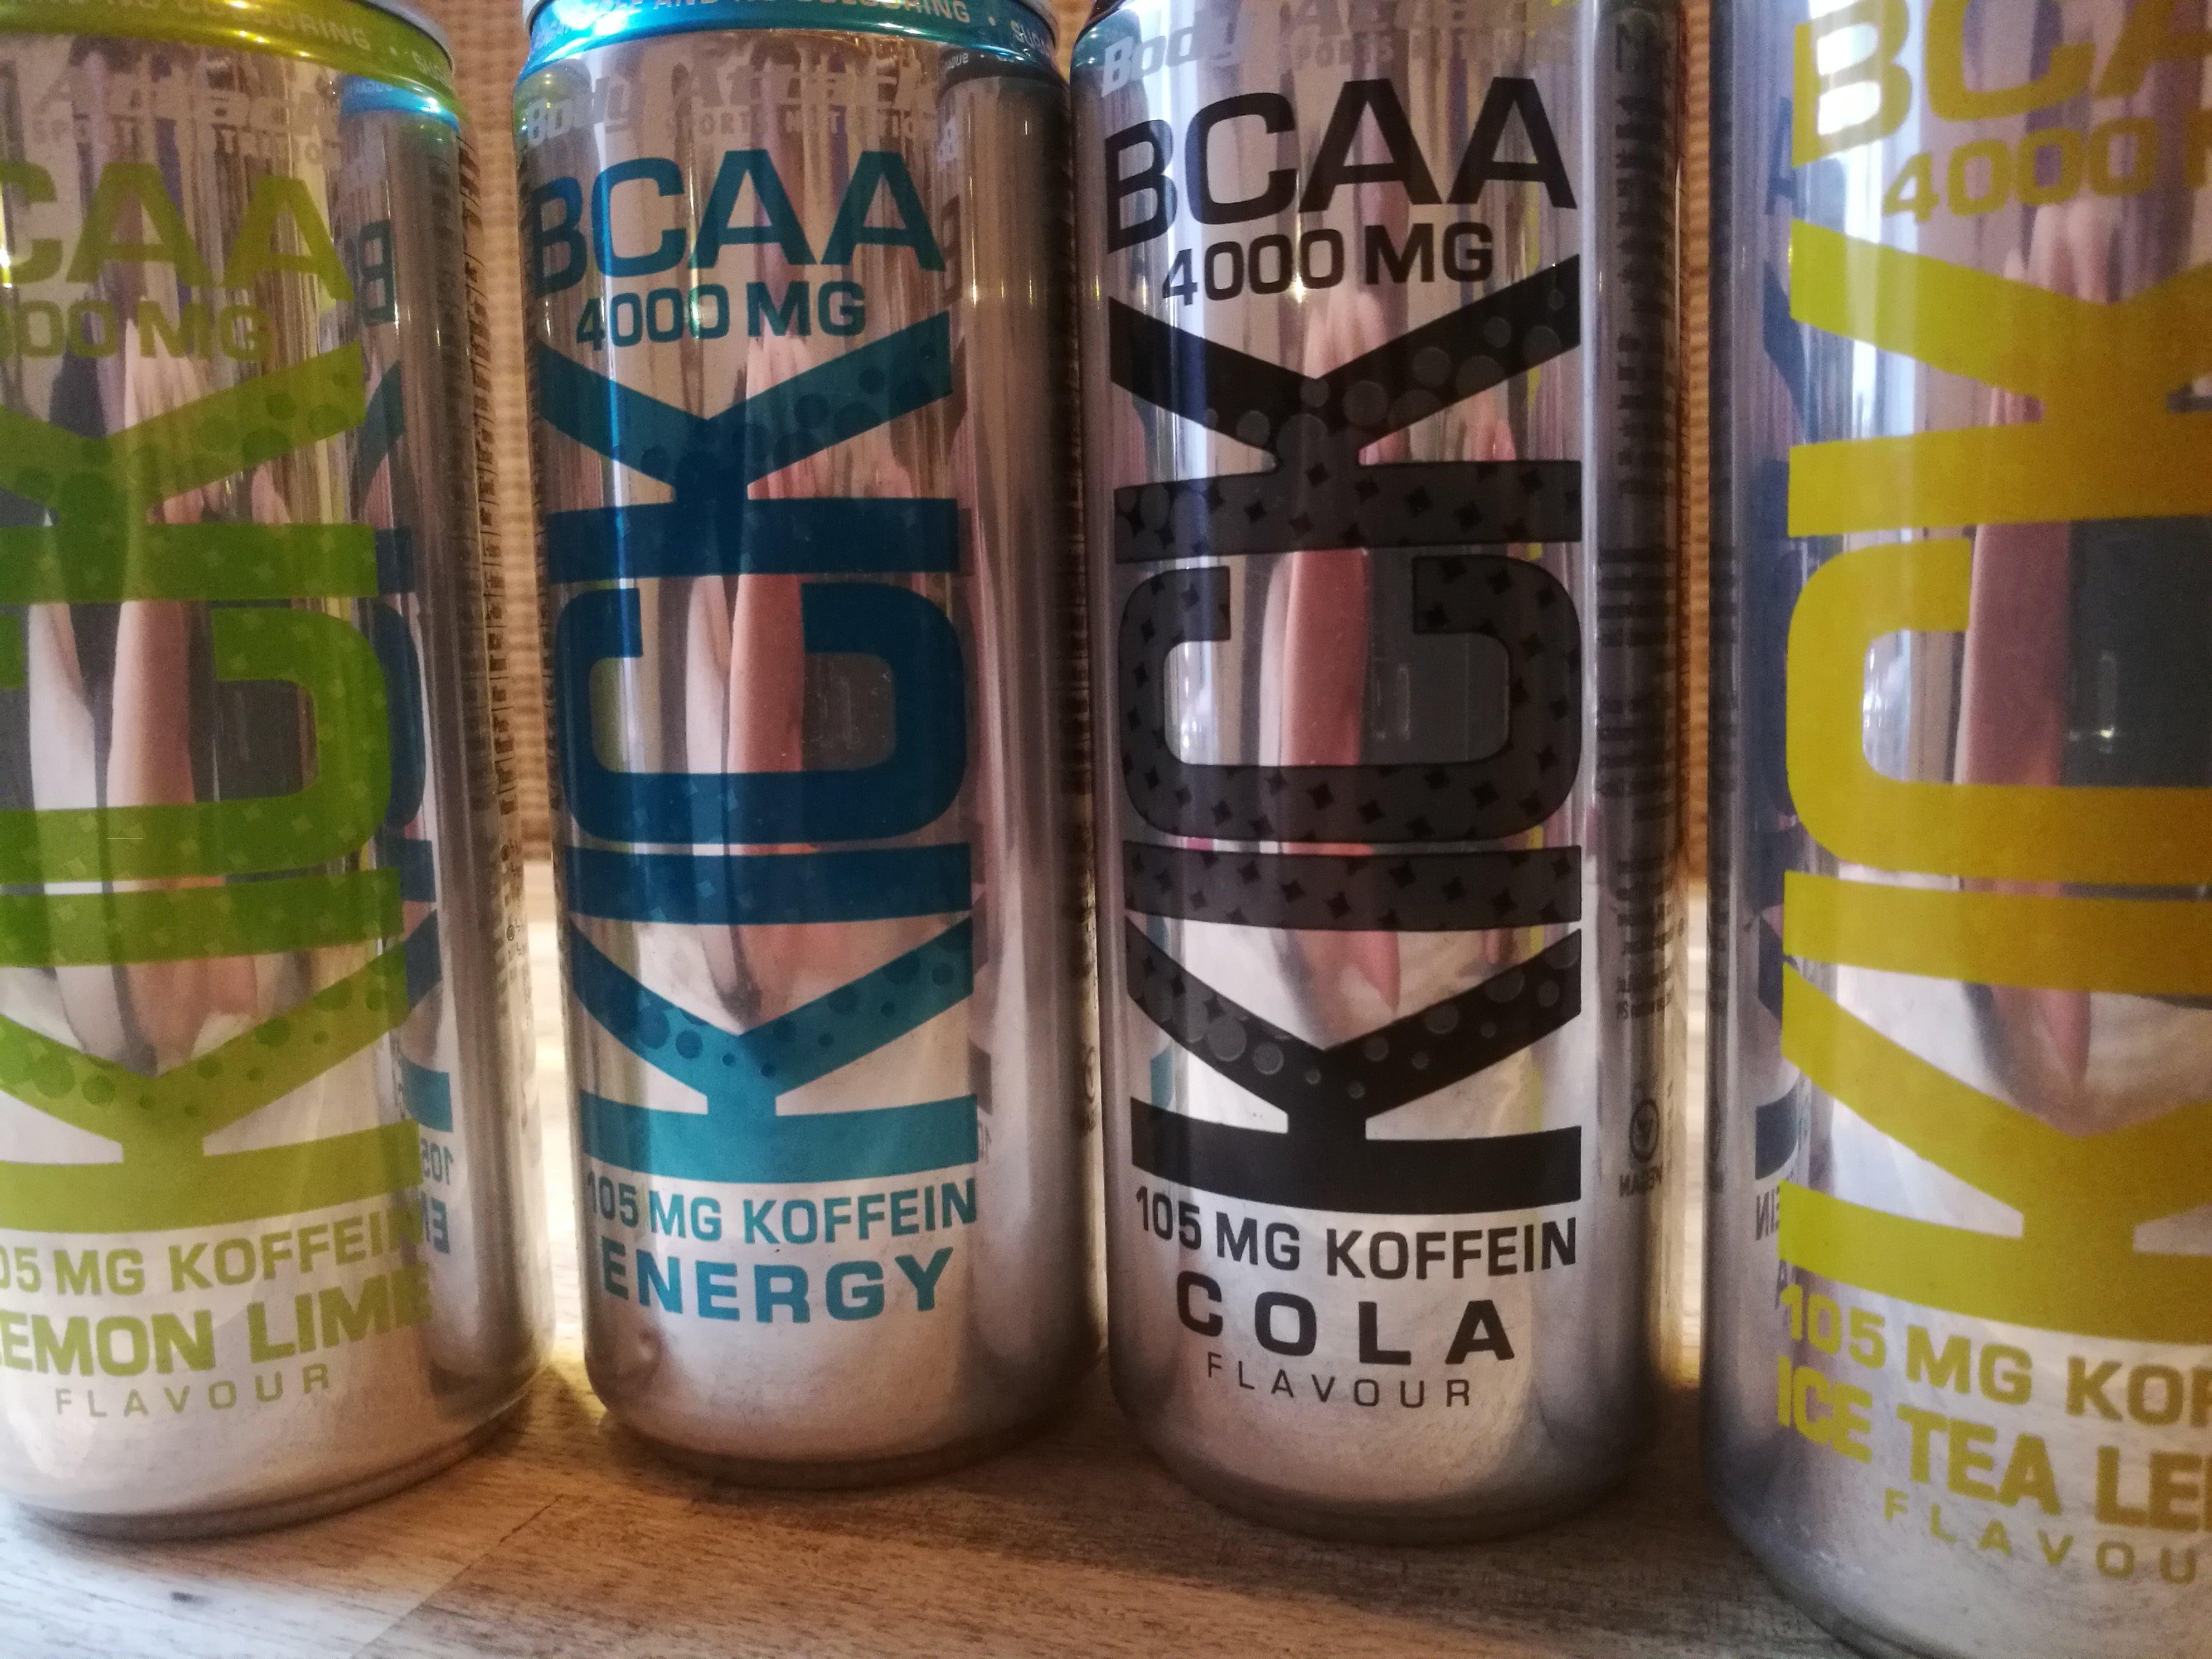 Bcaa Kick Body Attack body attack bcaa kick (330ml bcaa drink) - erfahrung